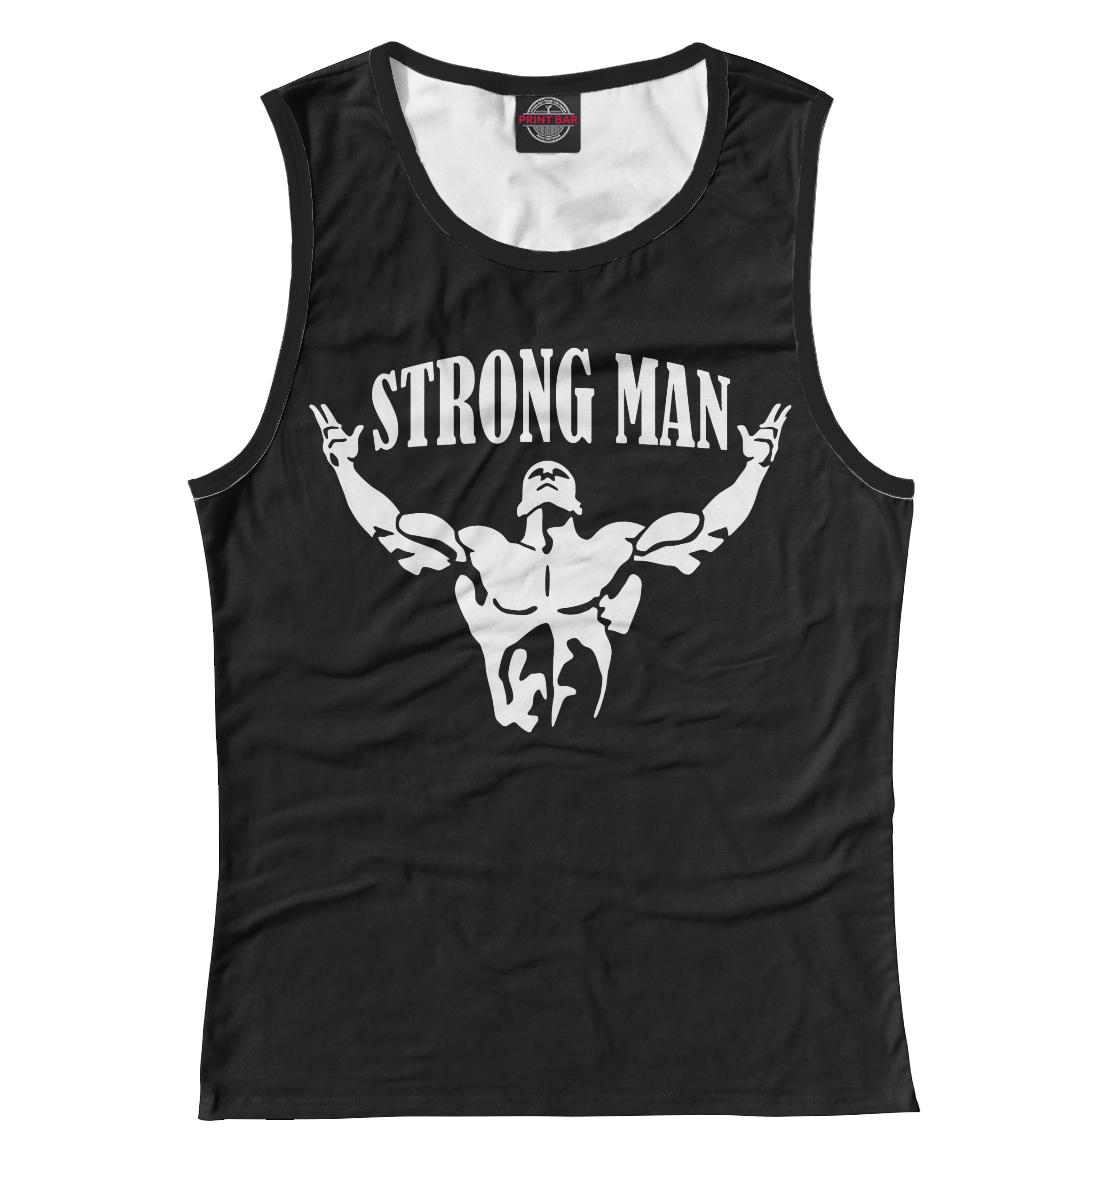 Strong man, Printbar, Майки, PWL-223974-may-1  - купить со скидкой